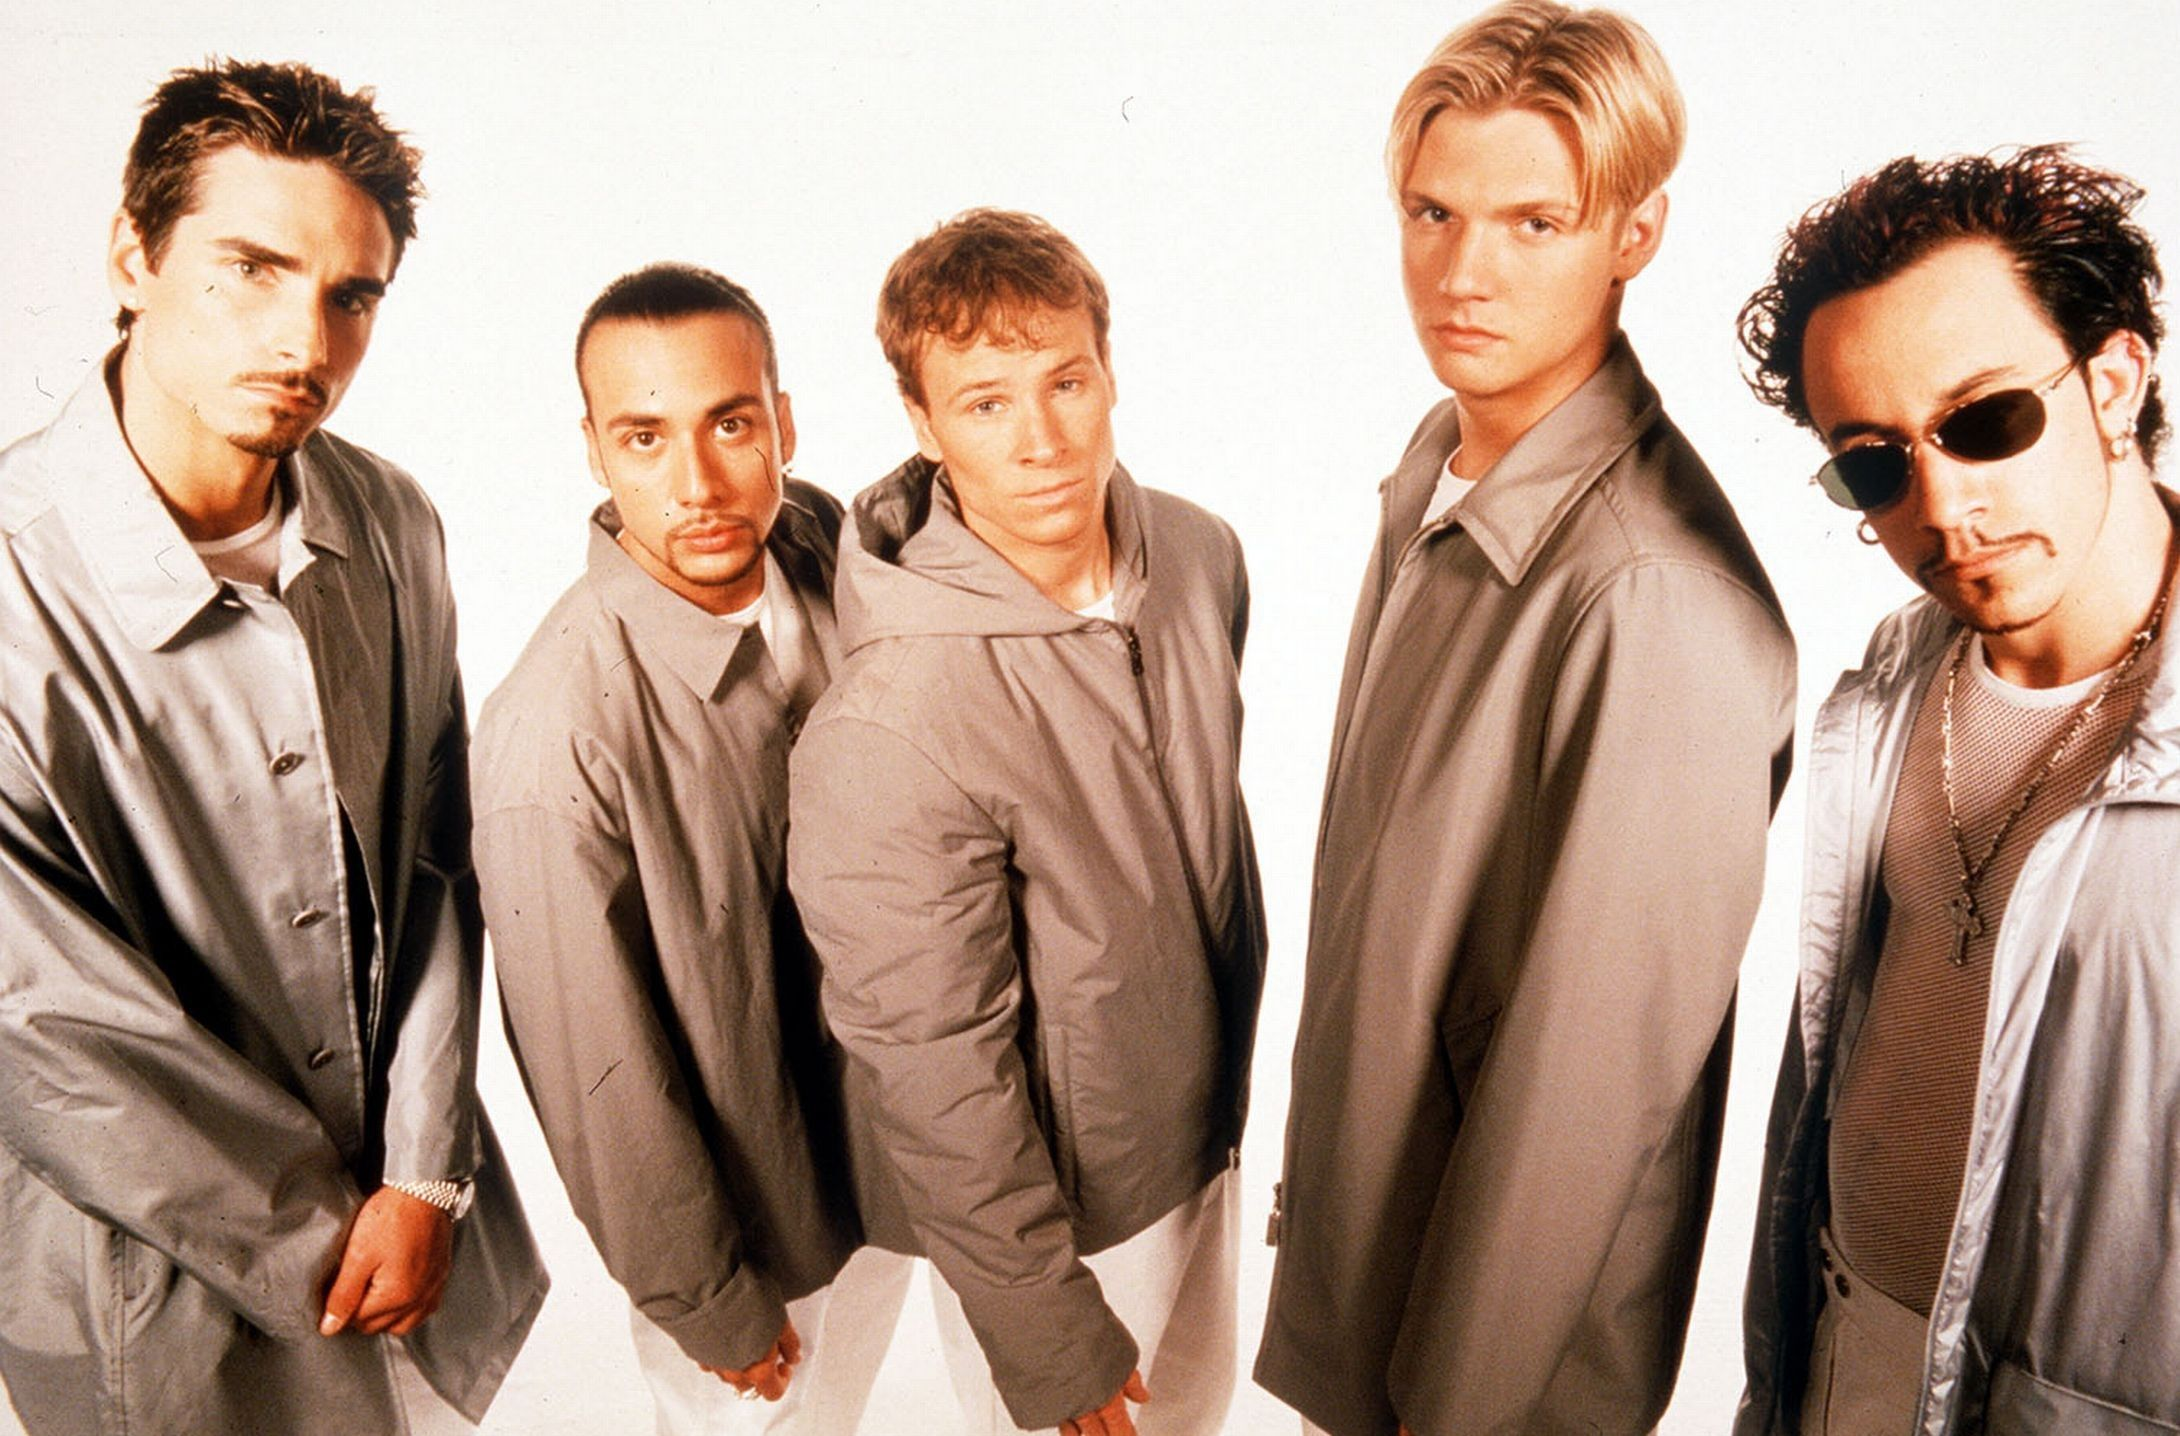 Backstreet Boys Computer Wallpapers - Wallpaper Cave